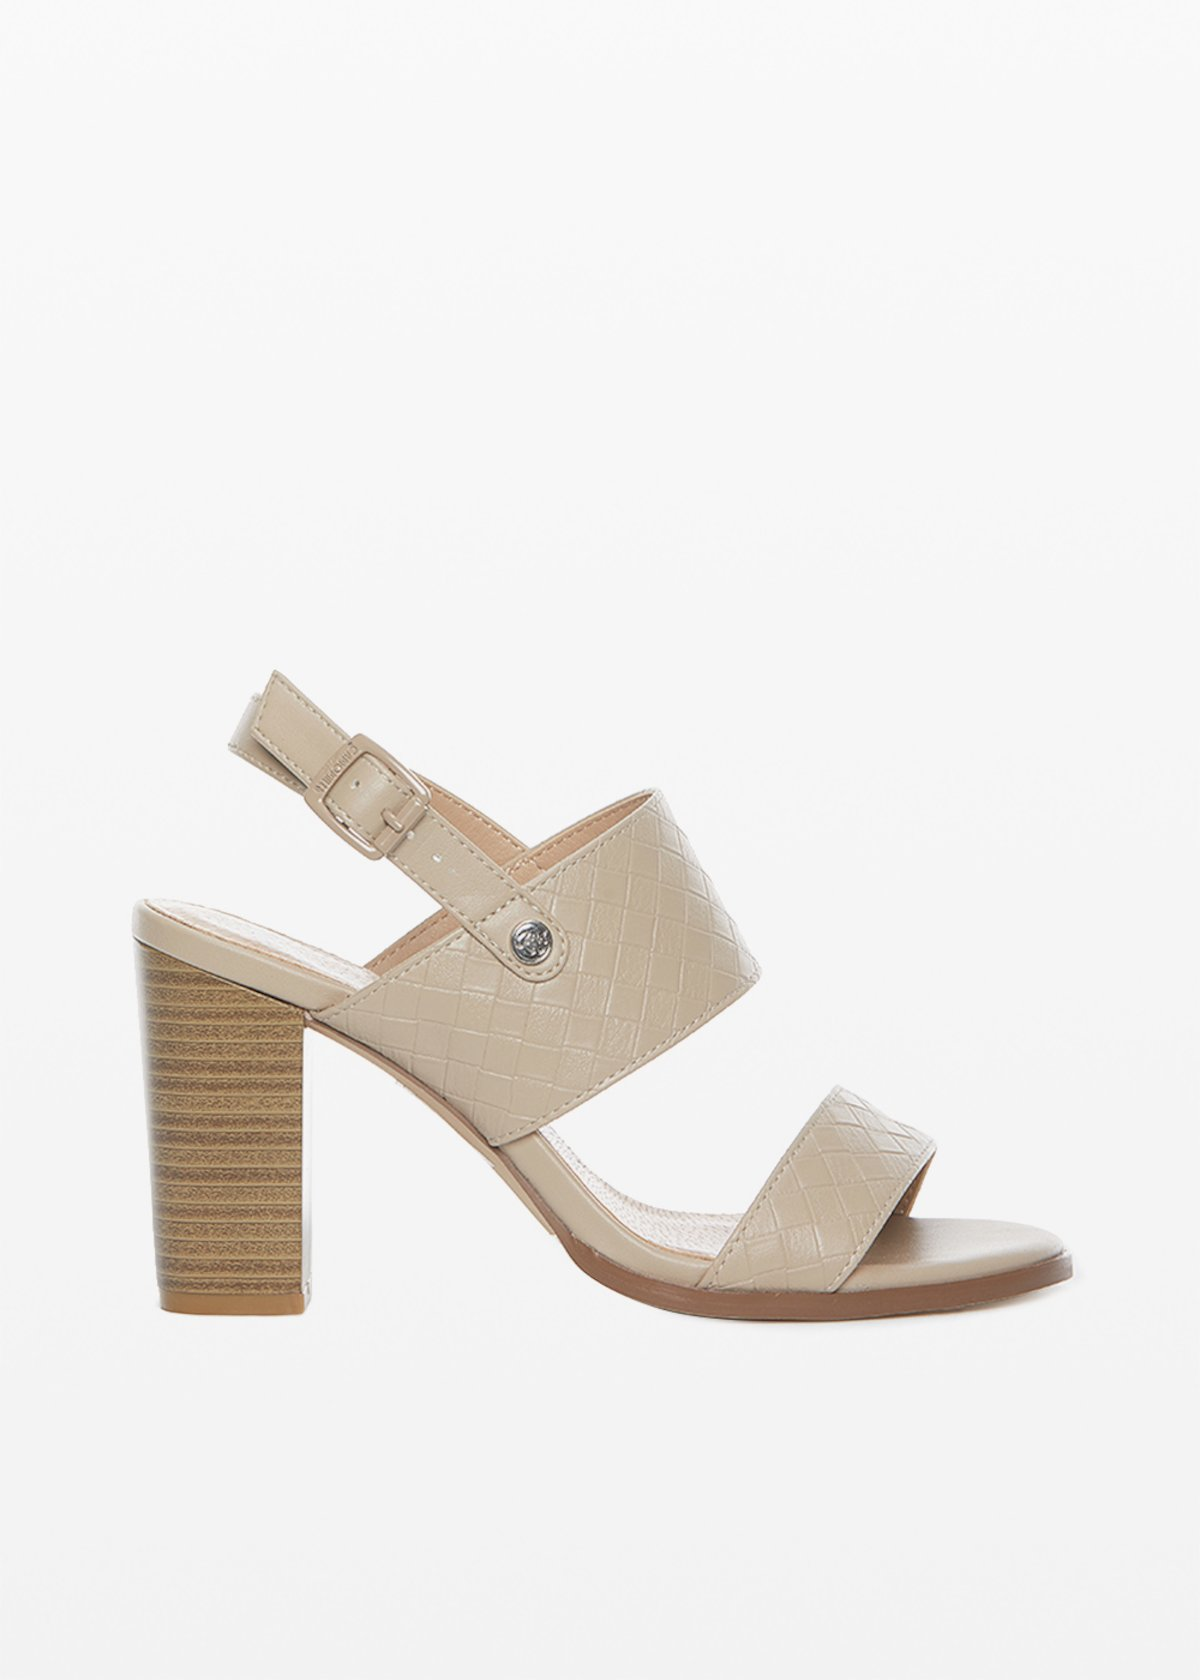 Sadik faux leather sandals - Doeskin - Woman - Category image